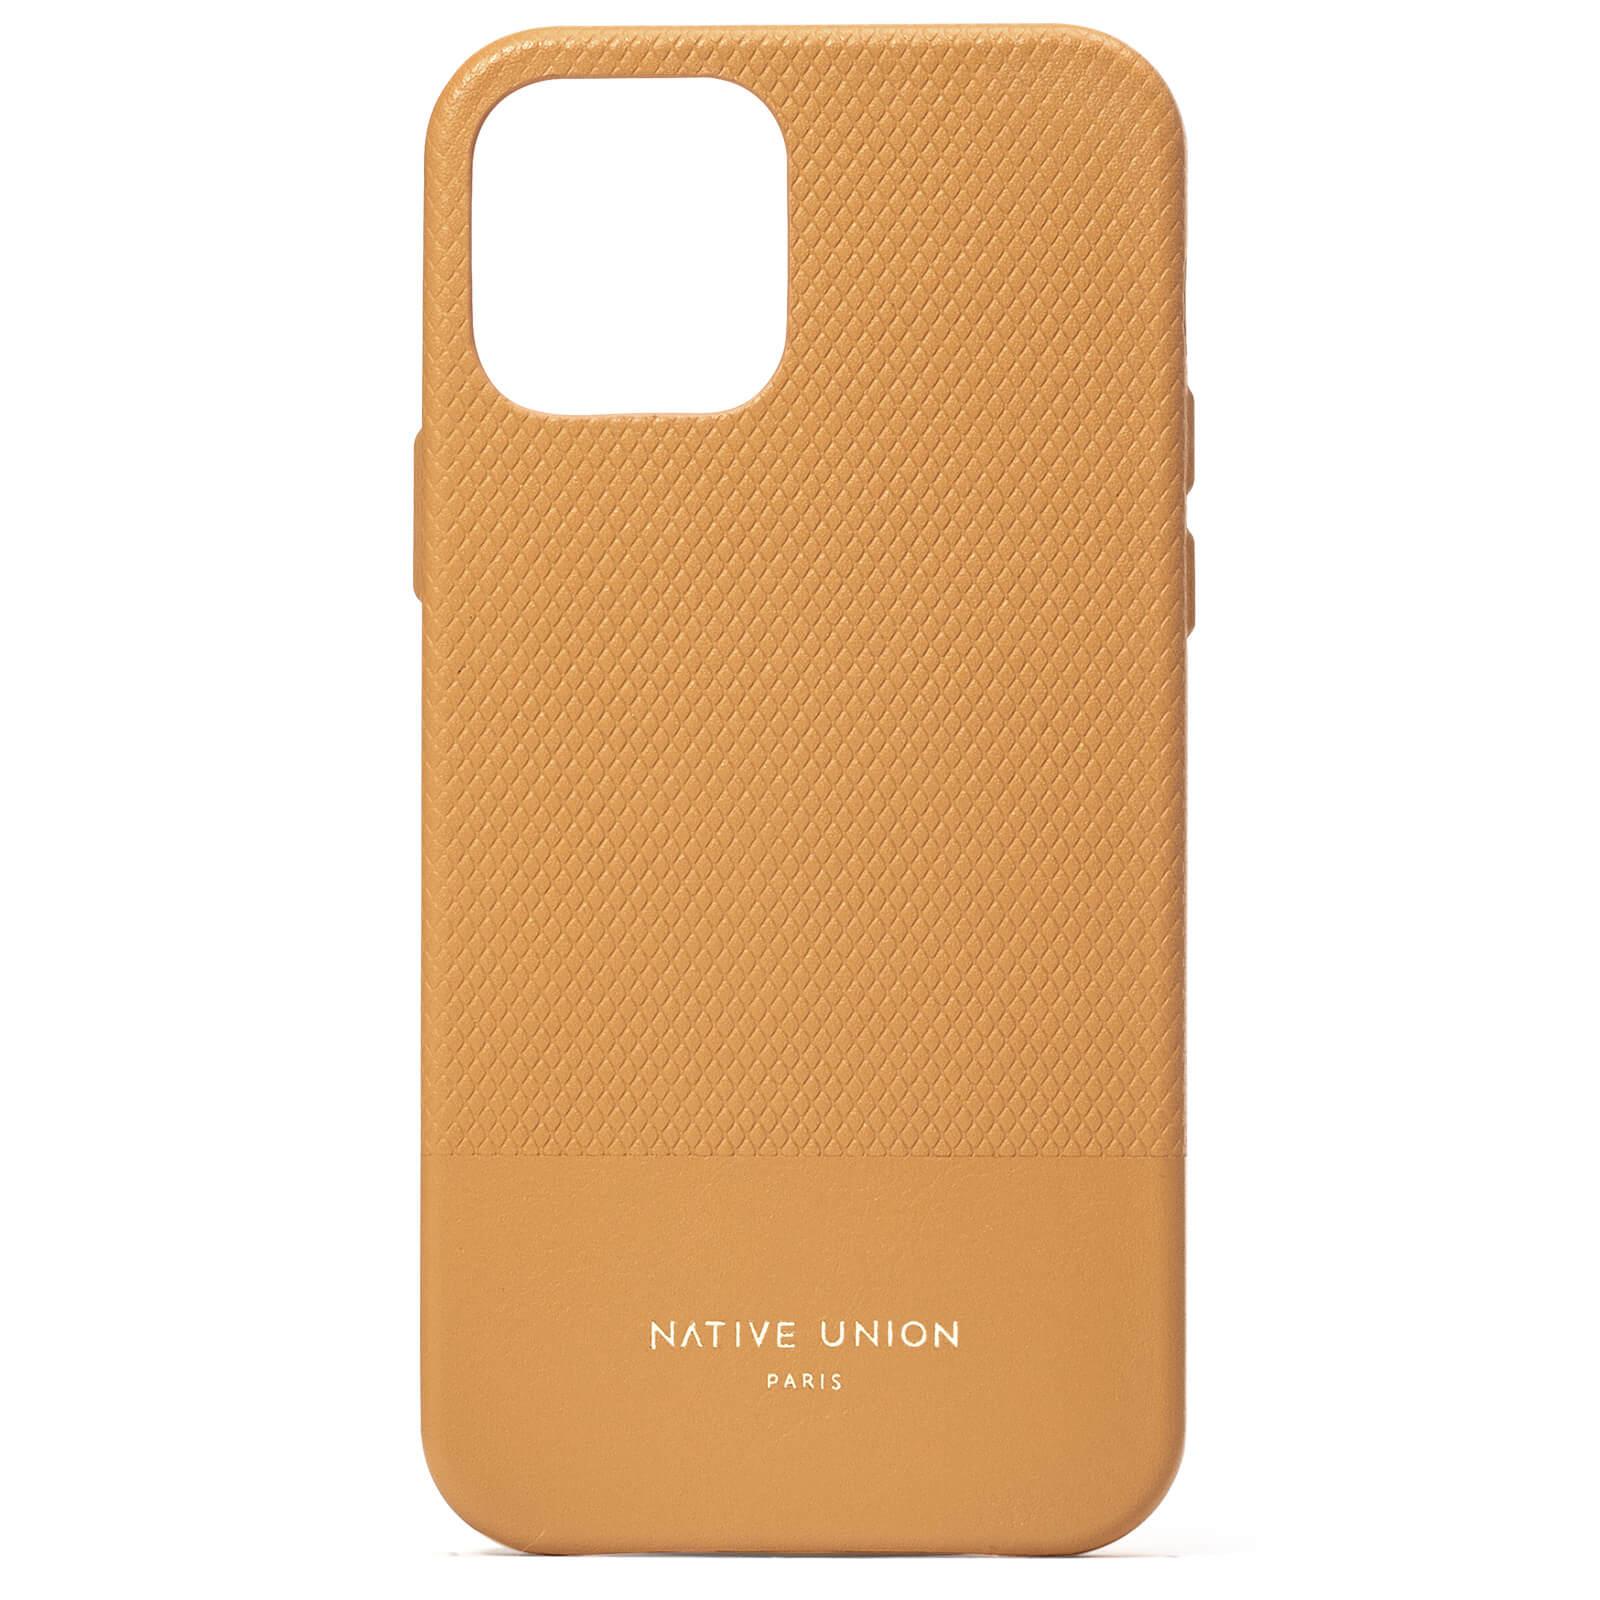 Native Union Clic Heritage iPhone Case - Ocre - iPhone 12/12 Pro